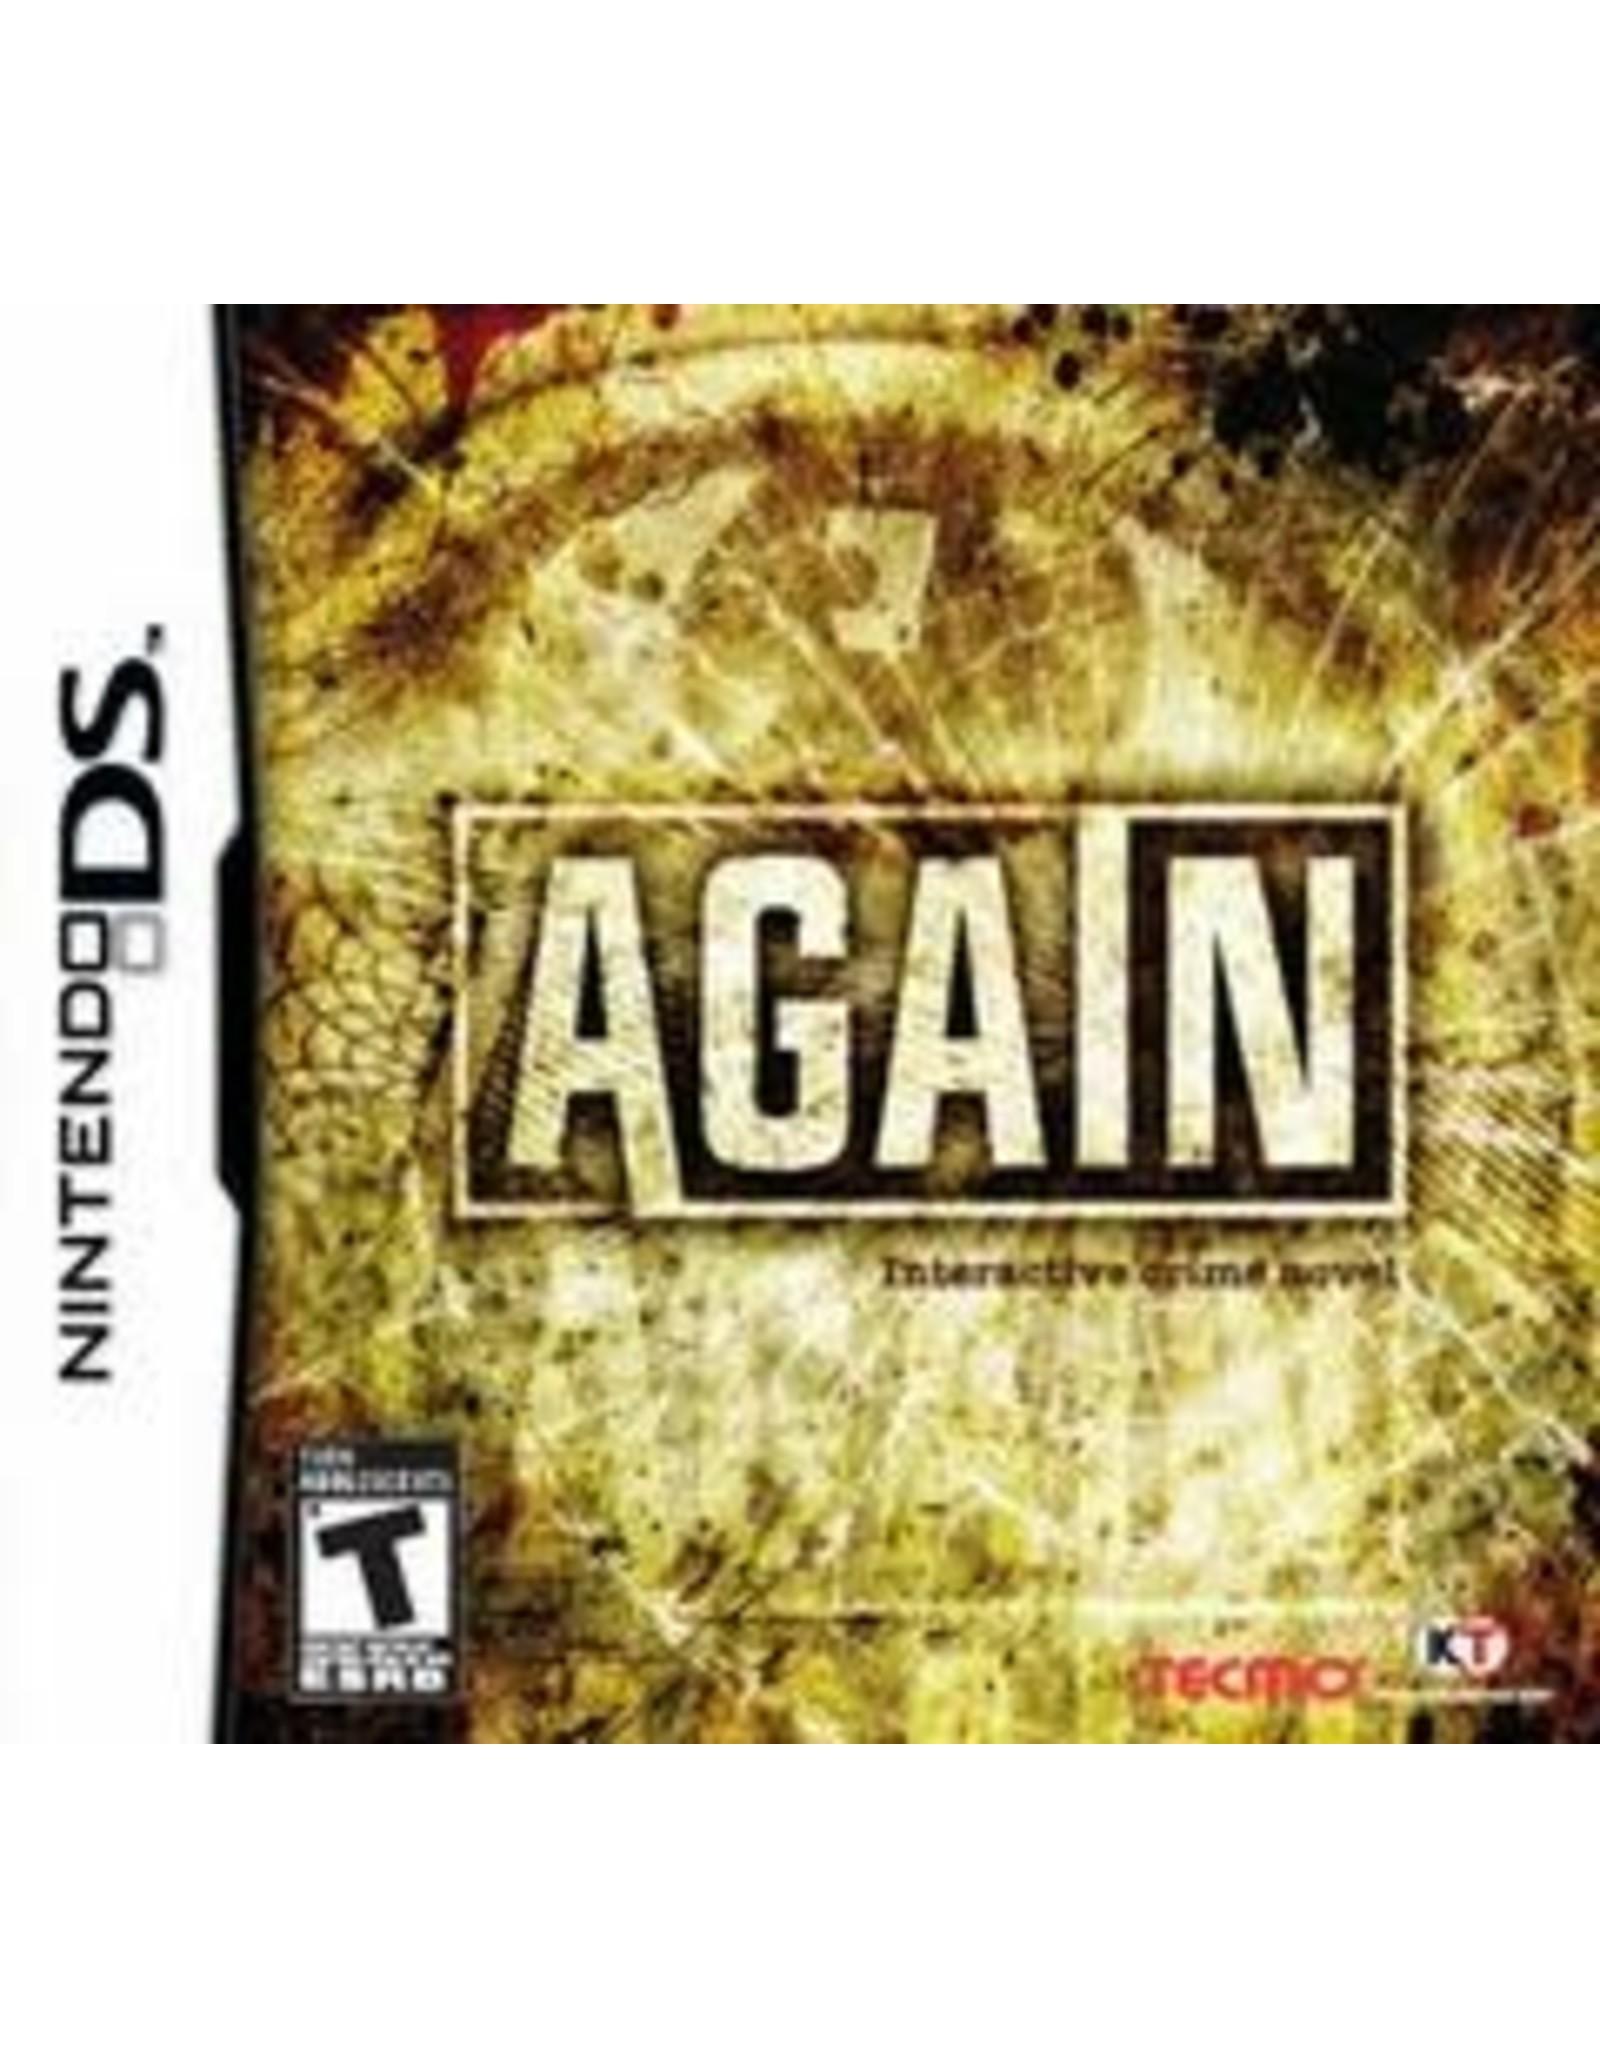 Nintendo DS Again (CiB)